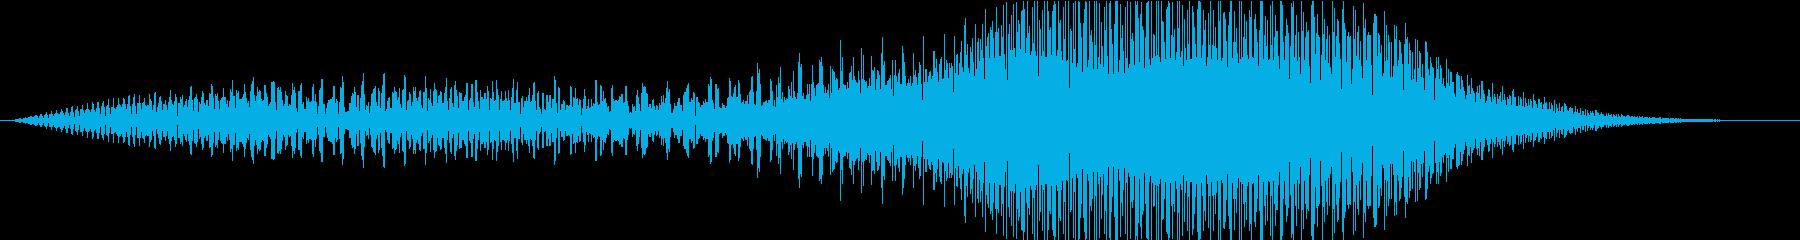 Sound logo, CM image of automobile company's reproduced waveform